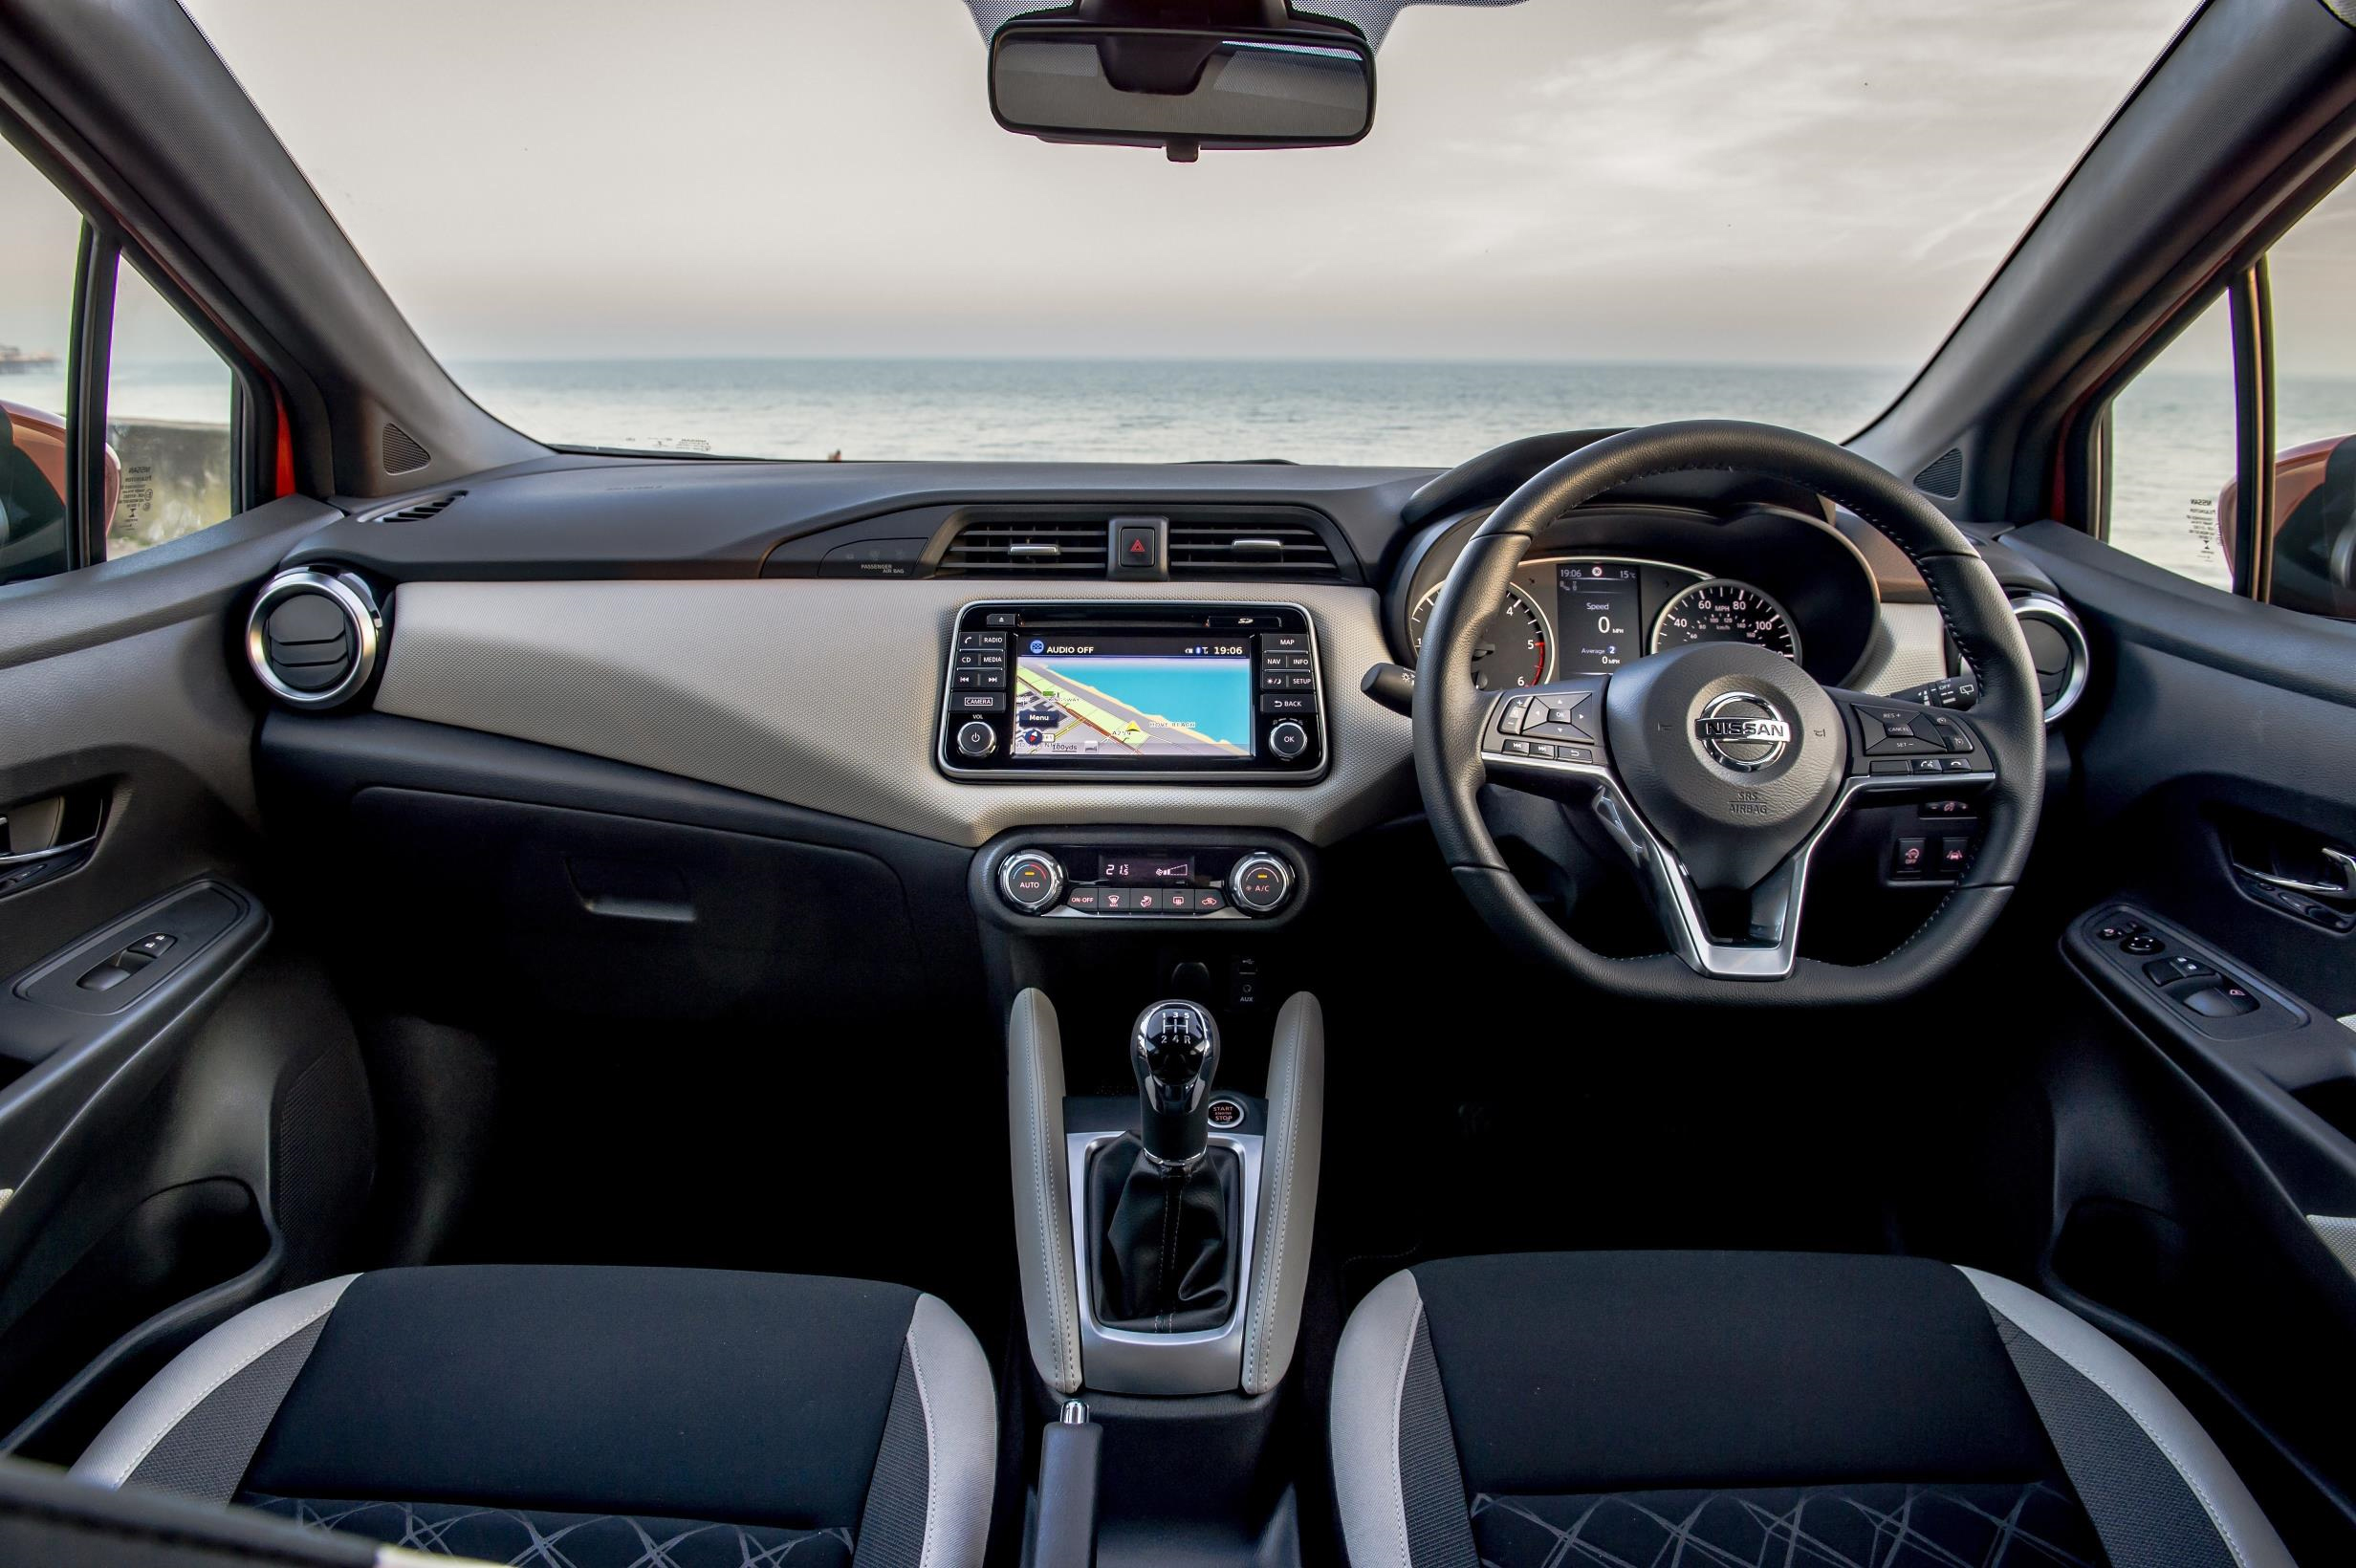 Nissan micra interior.jpg (1016 KB)